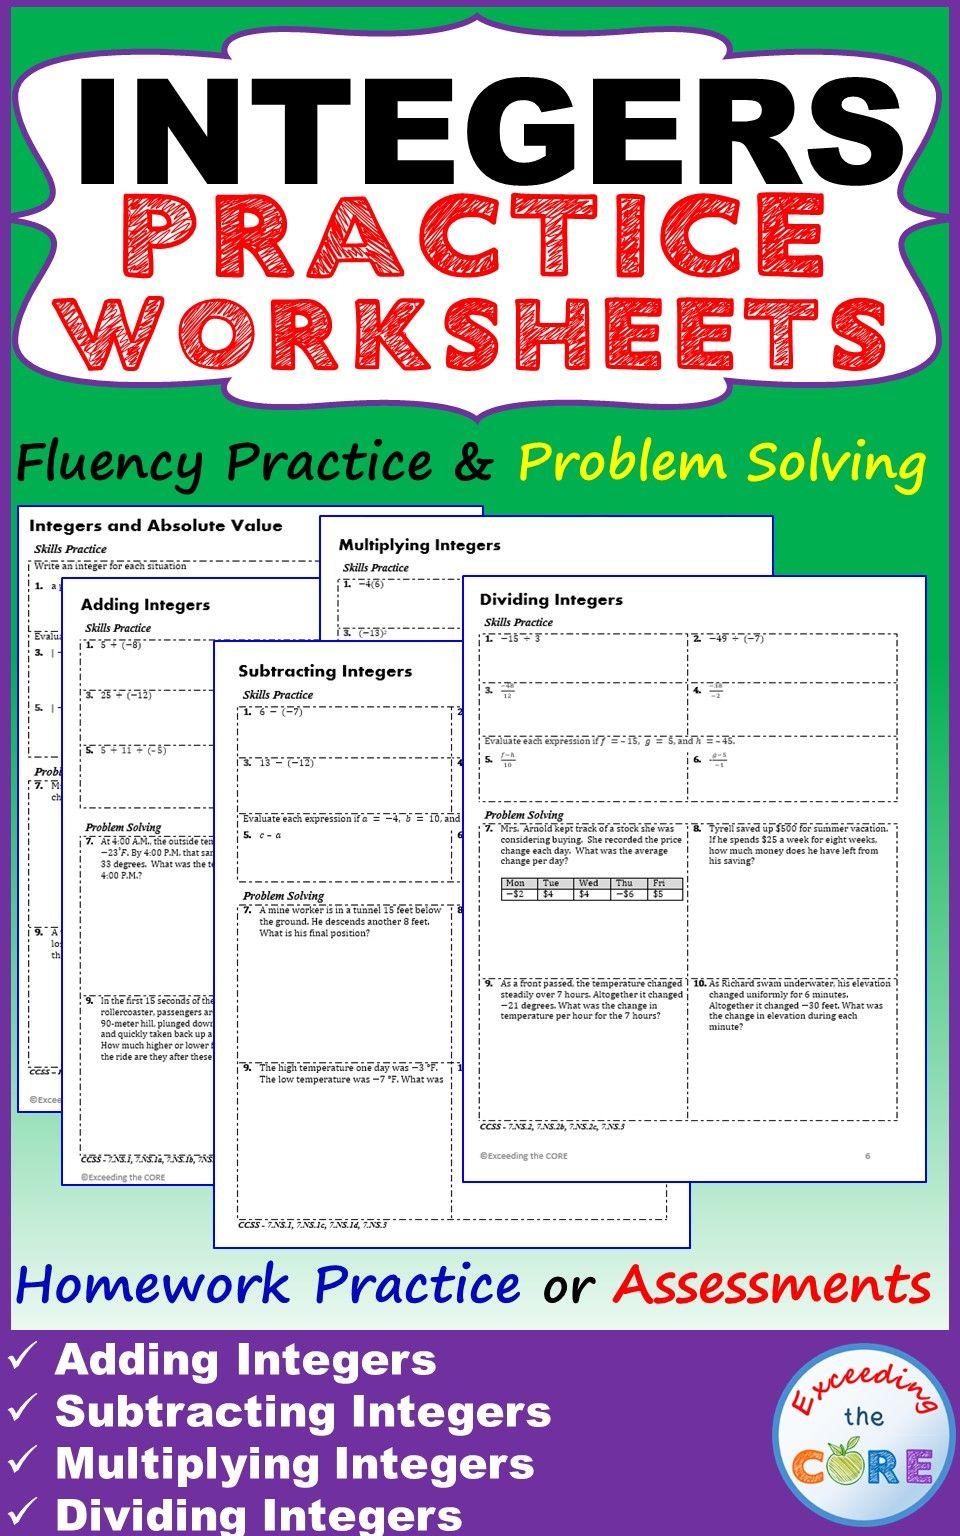 medium resolution of INTEGERS Homework Practice Worksheets - Skills Practice with Word Problems  ~ 5 INTEGER practice worksheets (50 qu…   Integers word problems